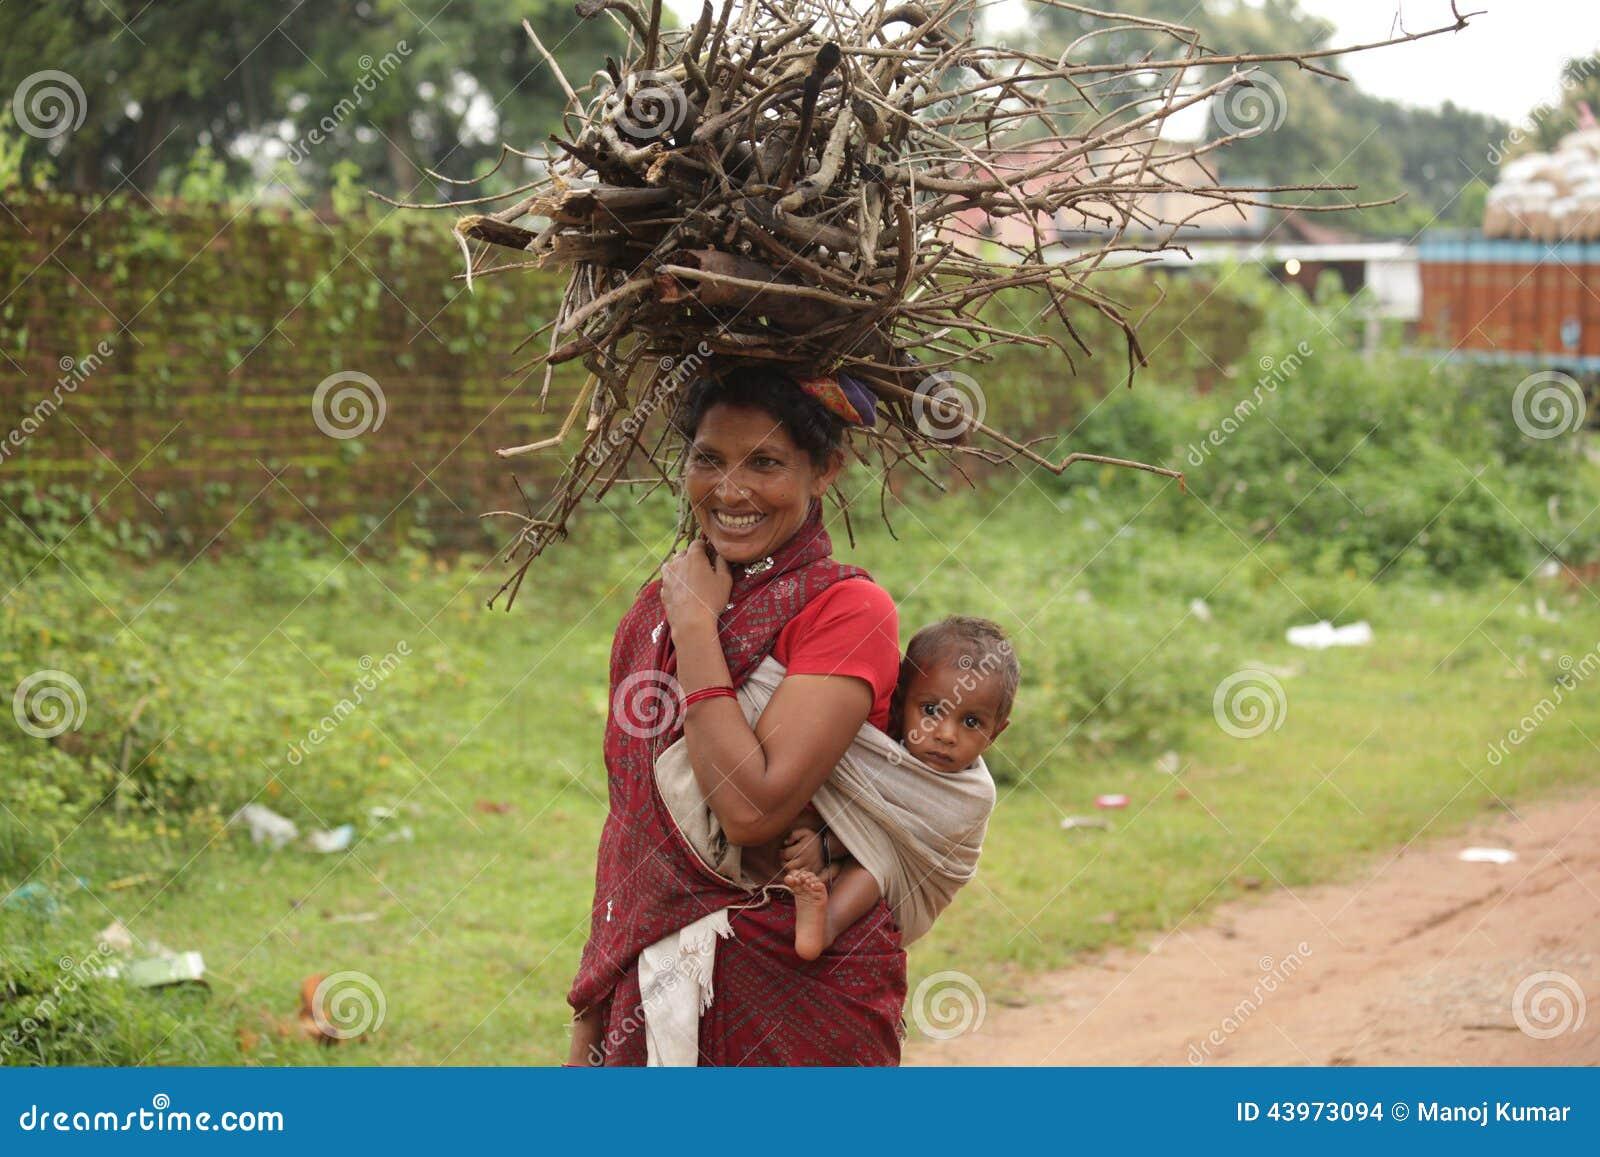 Glückliche arme Frau